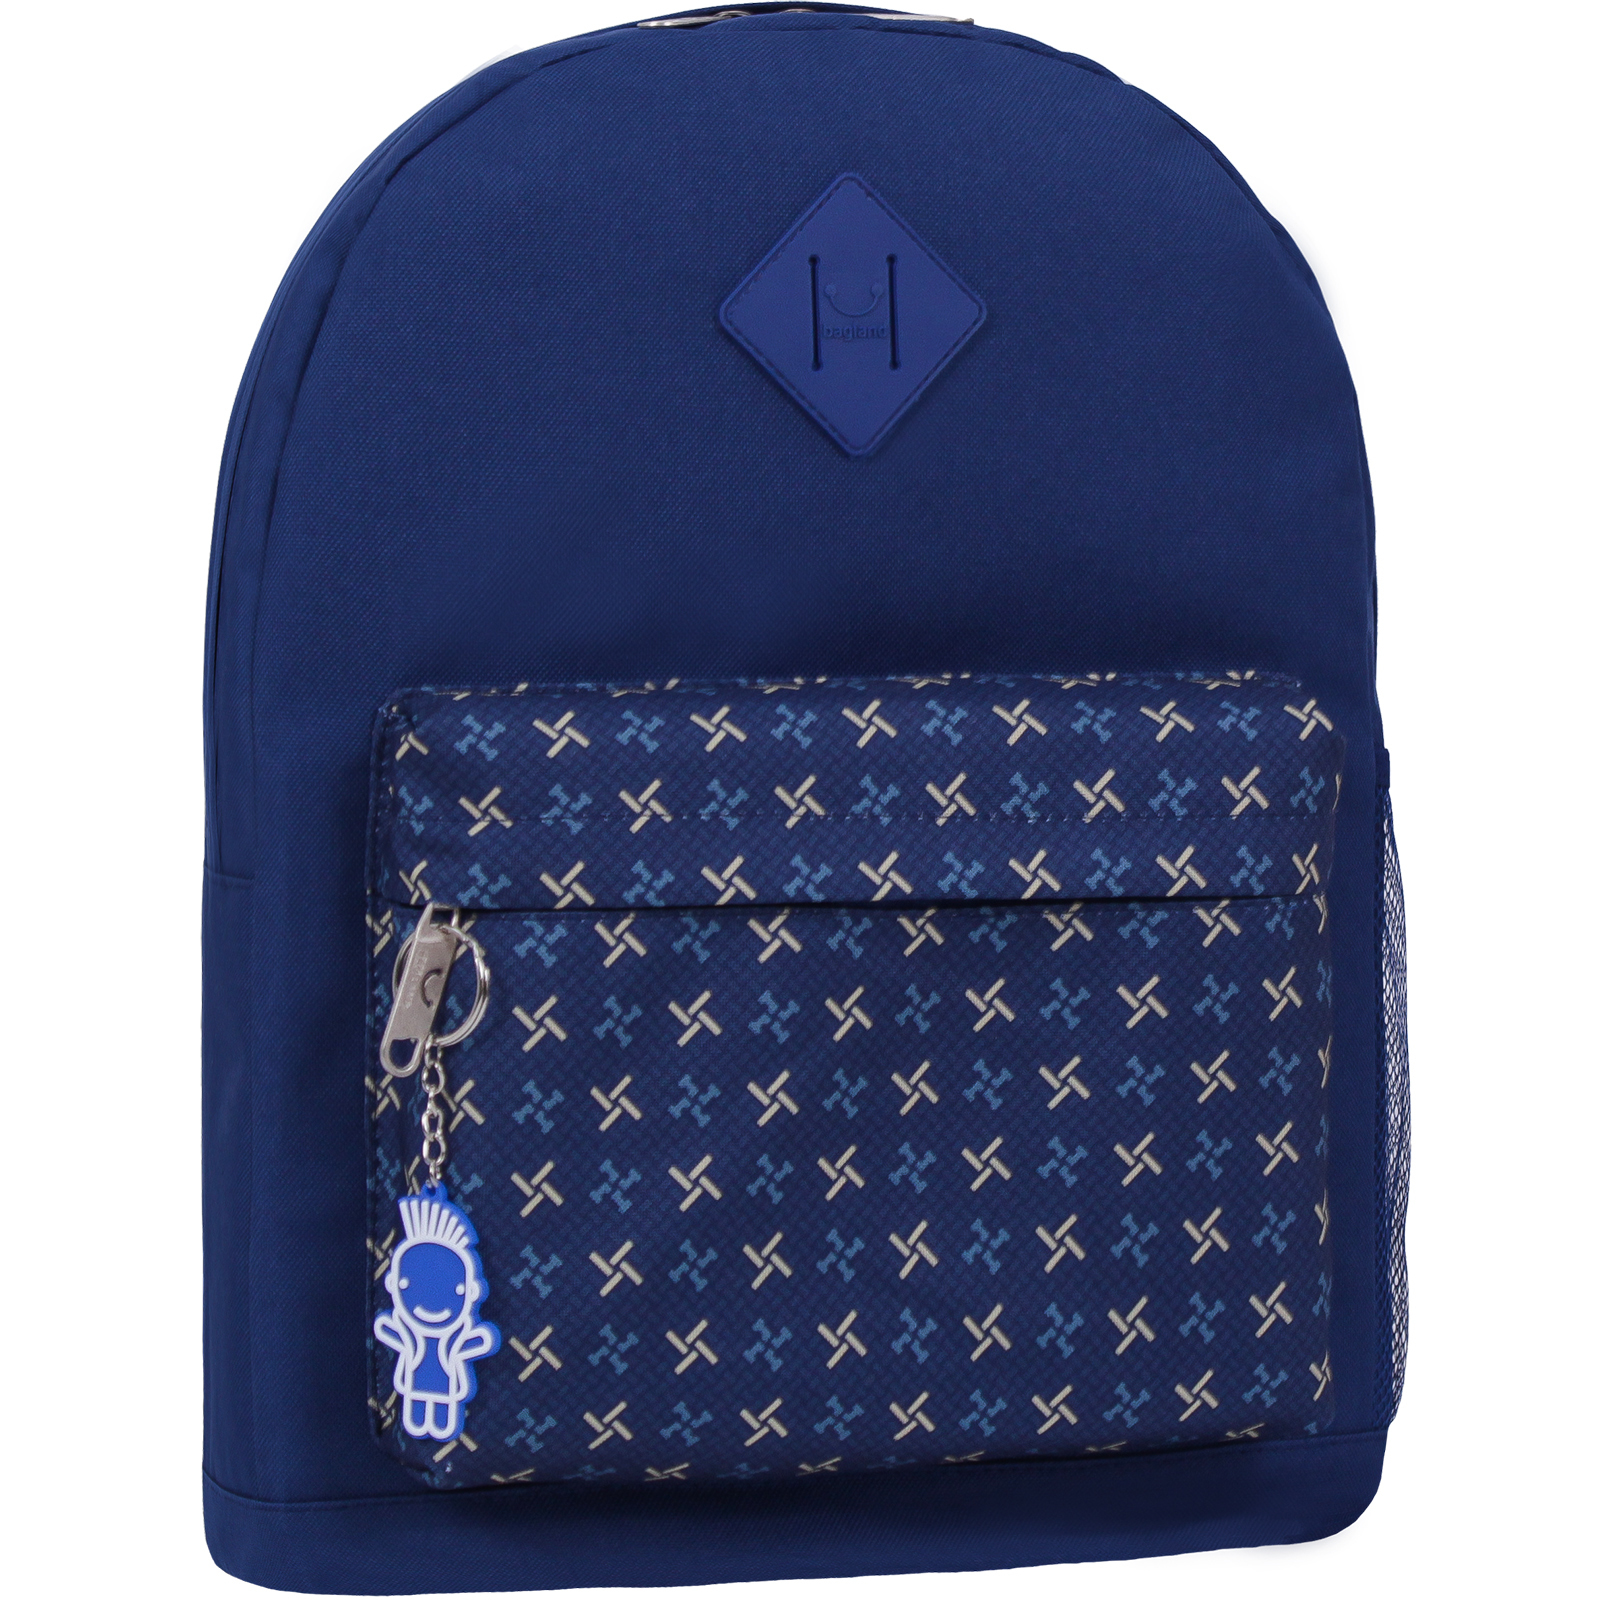 Городские рюкзаки Рюкзак Bagland Молодежный W/R 17 л. Синий 463 (00533662) IMG_2301_463_1600.jpg